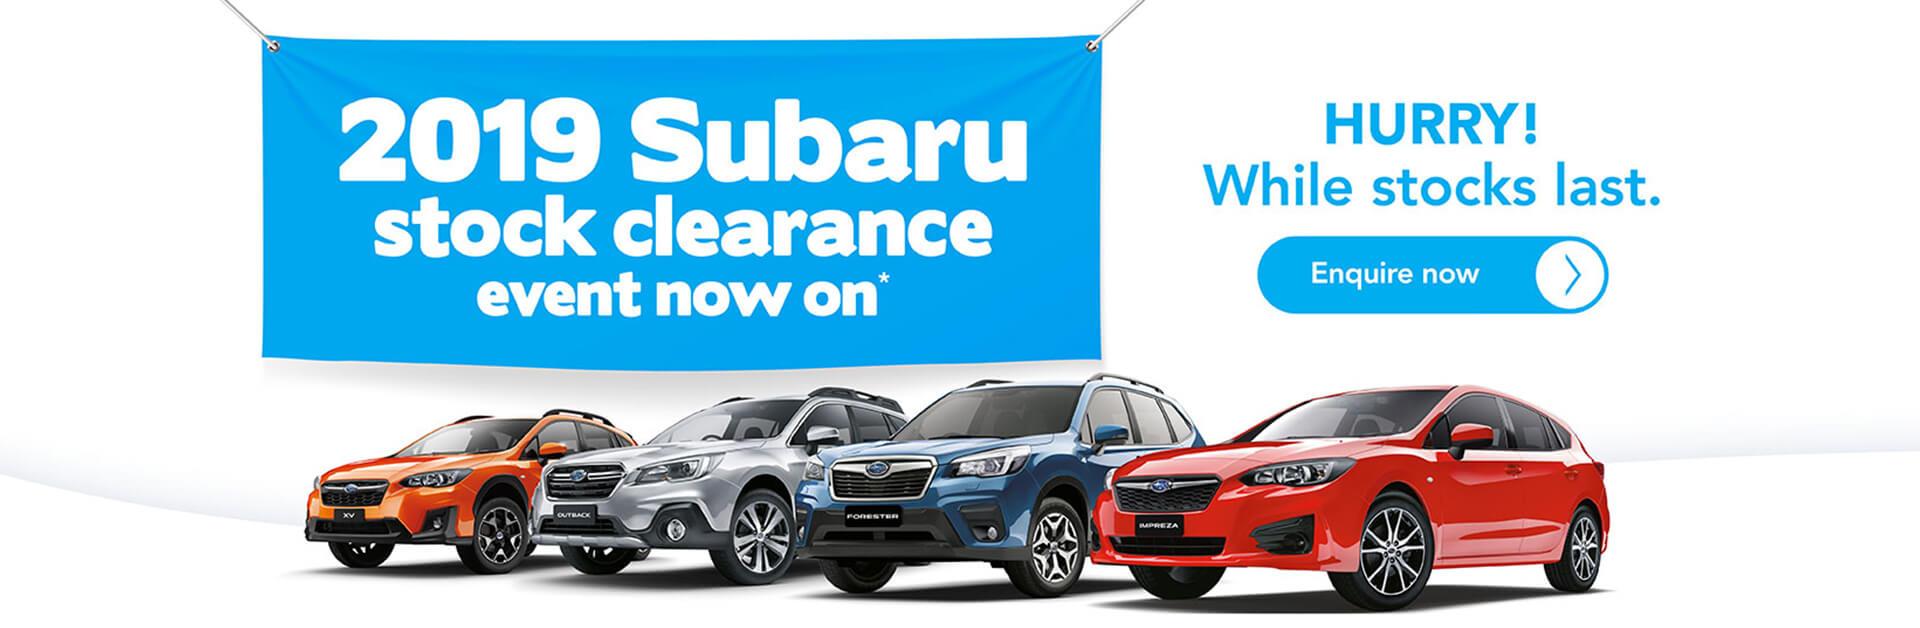 Woodleys Subaru offers